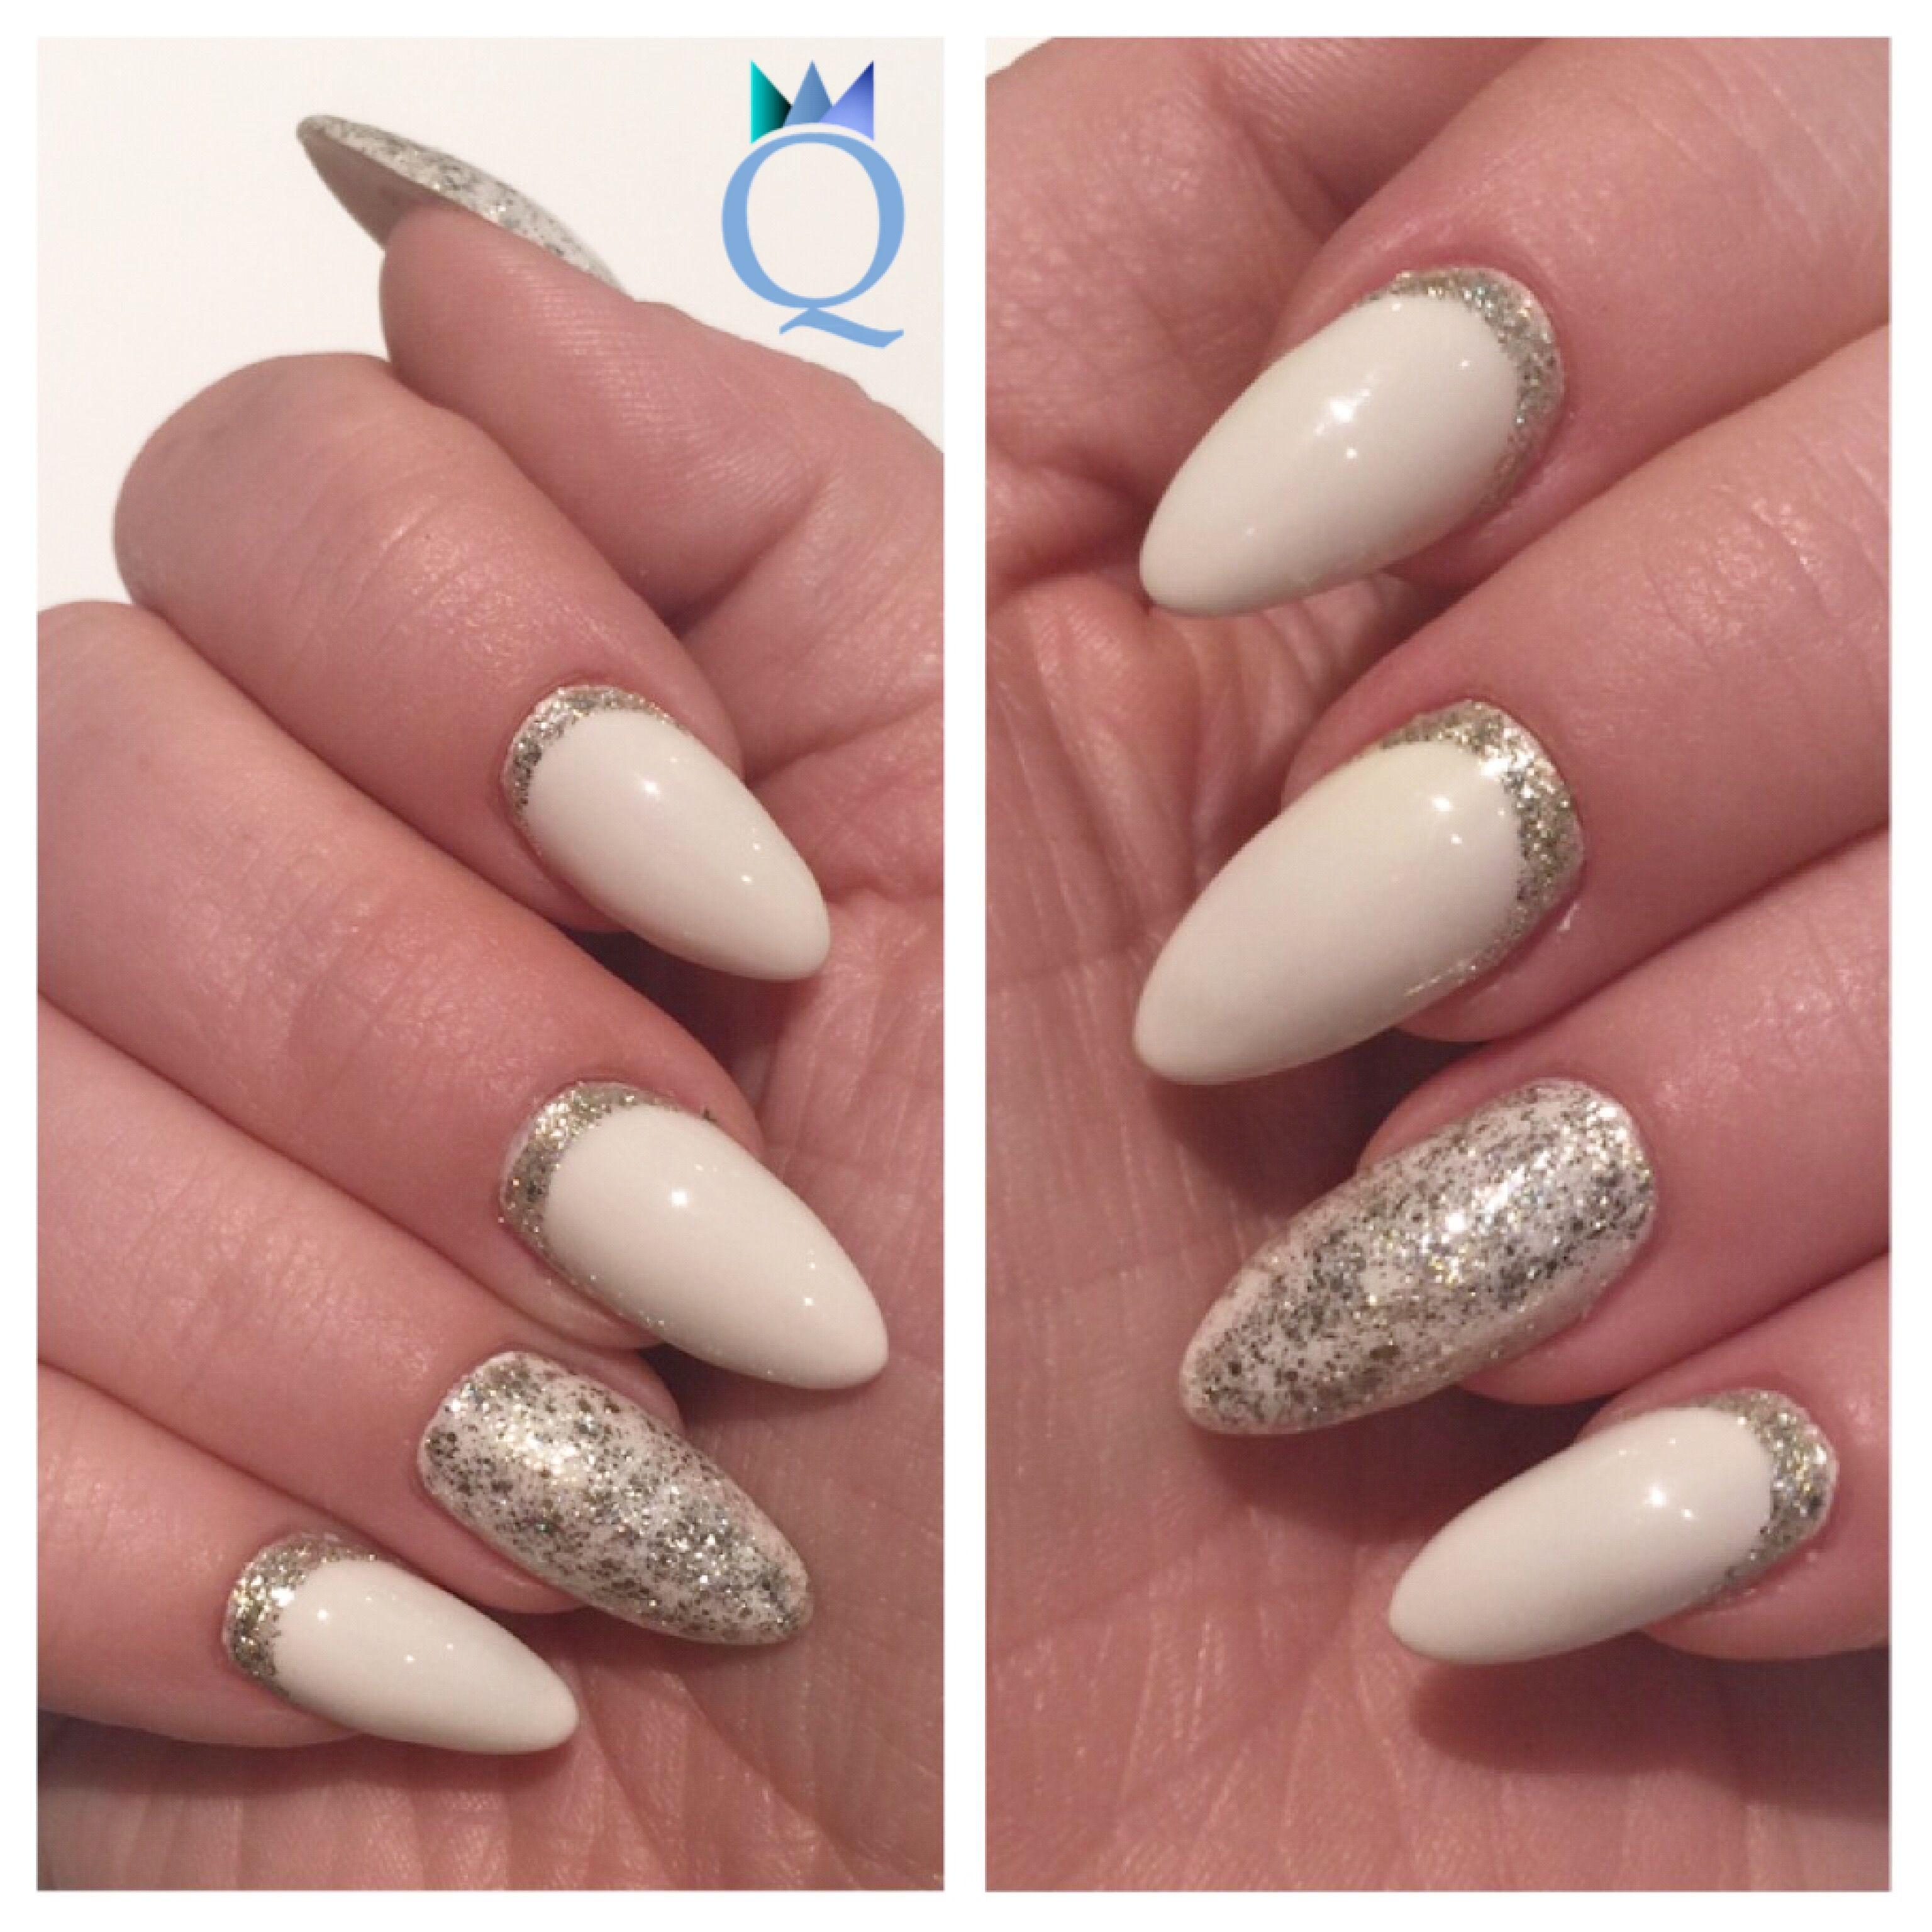 almondshape #gelnails #nails #softwhite #akyado #silver #glitter ...